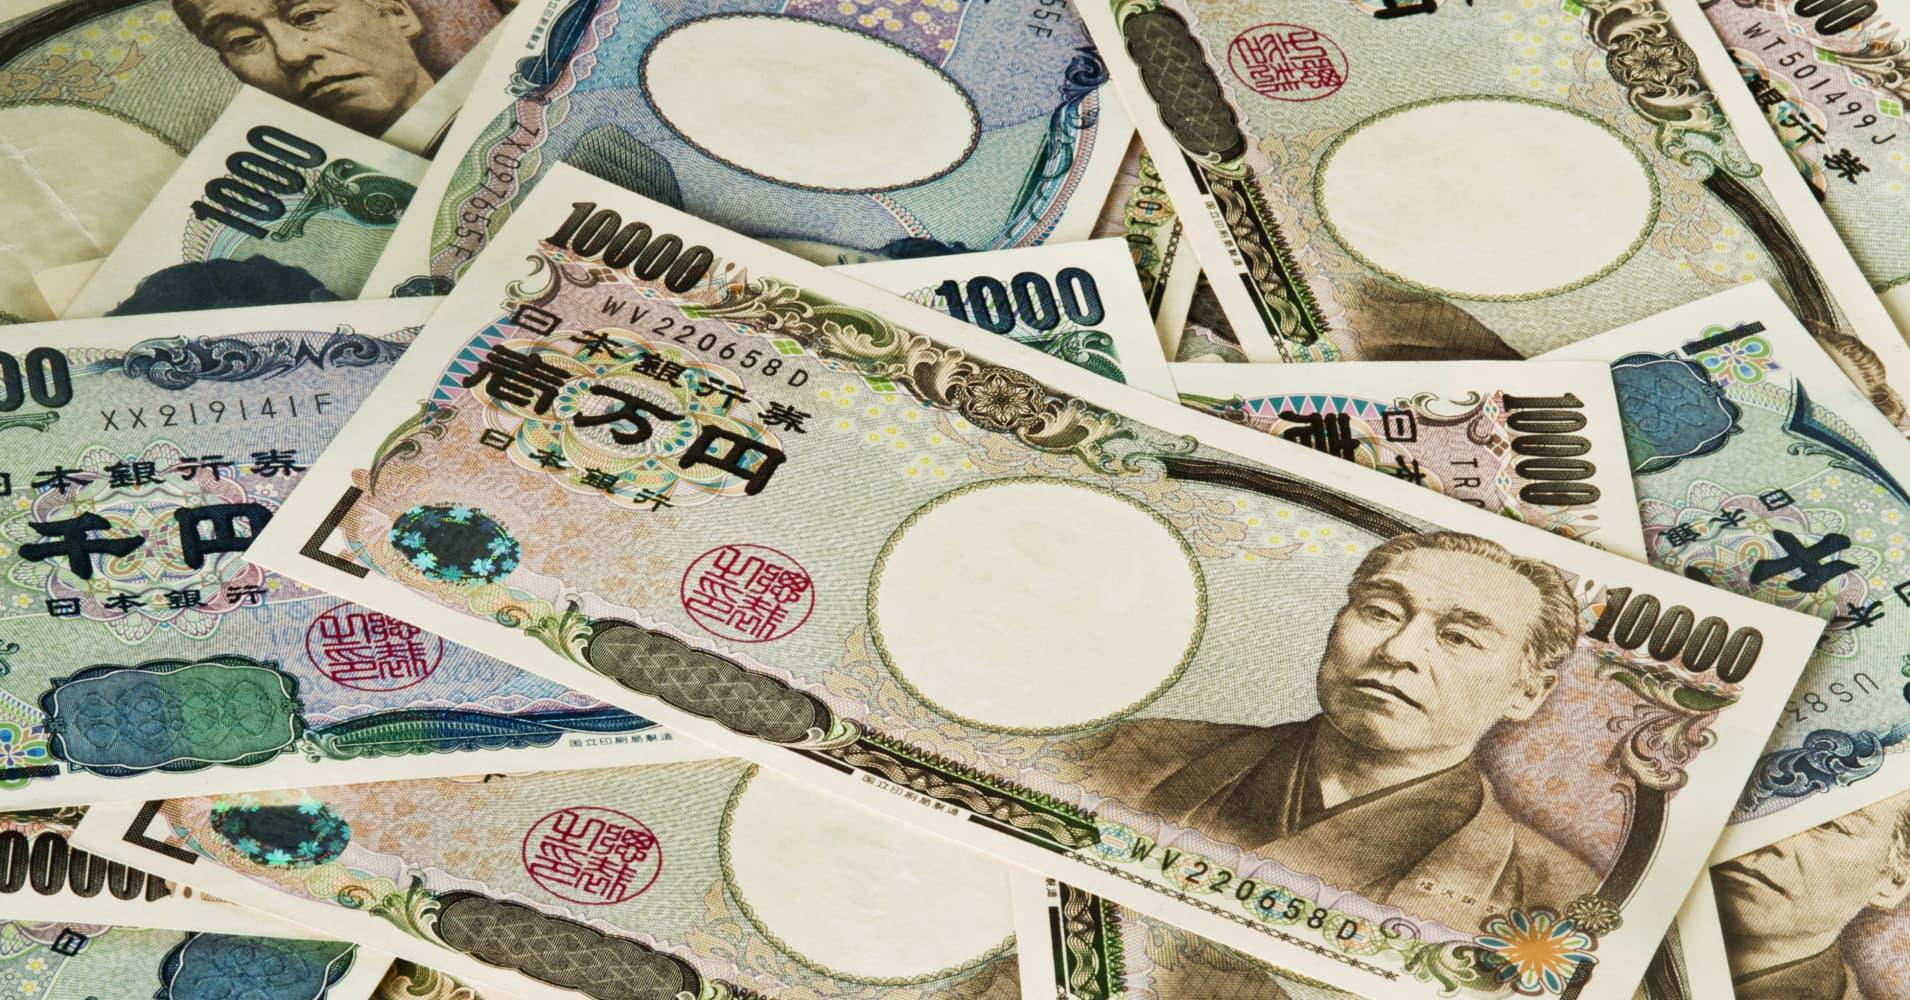 Japan's debt looks like this: 1,000,000,000,000,000 yen